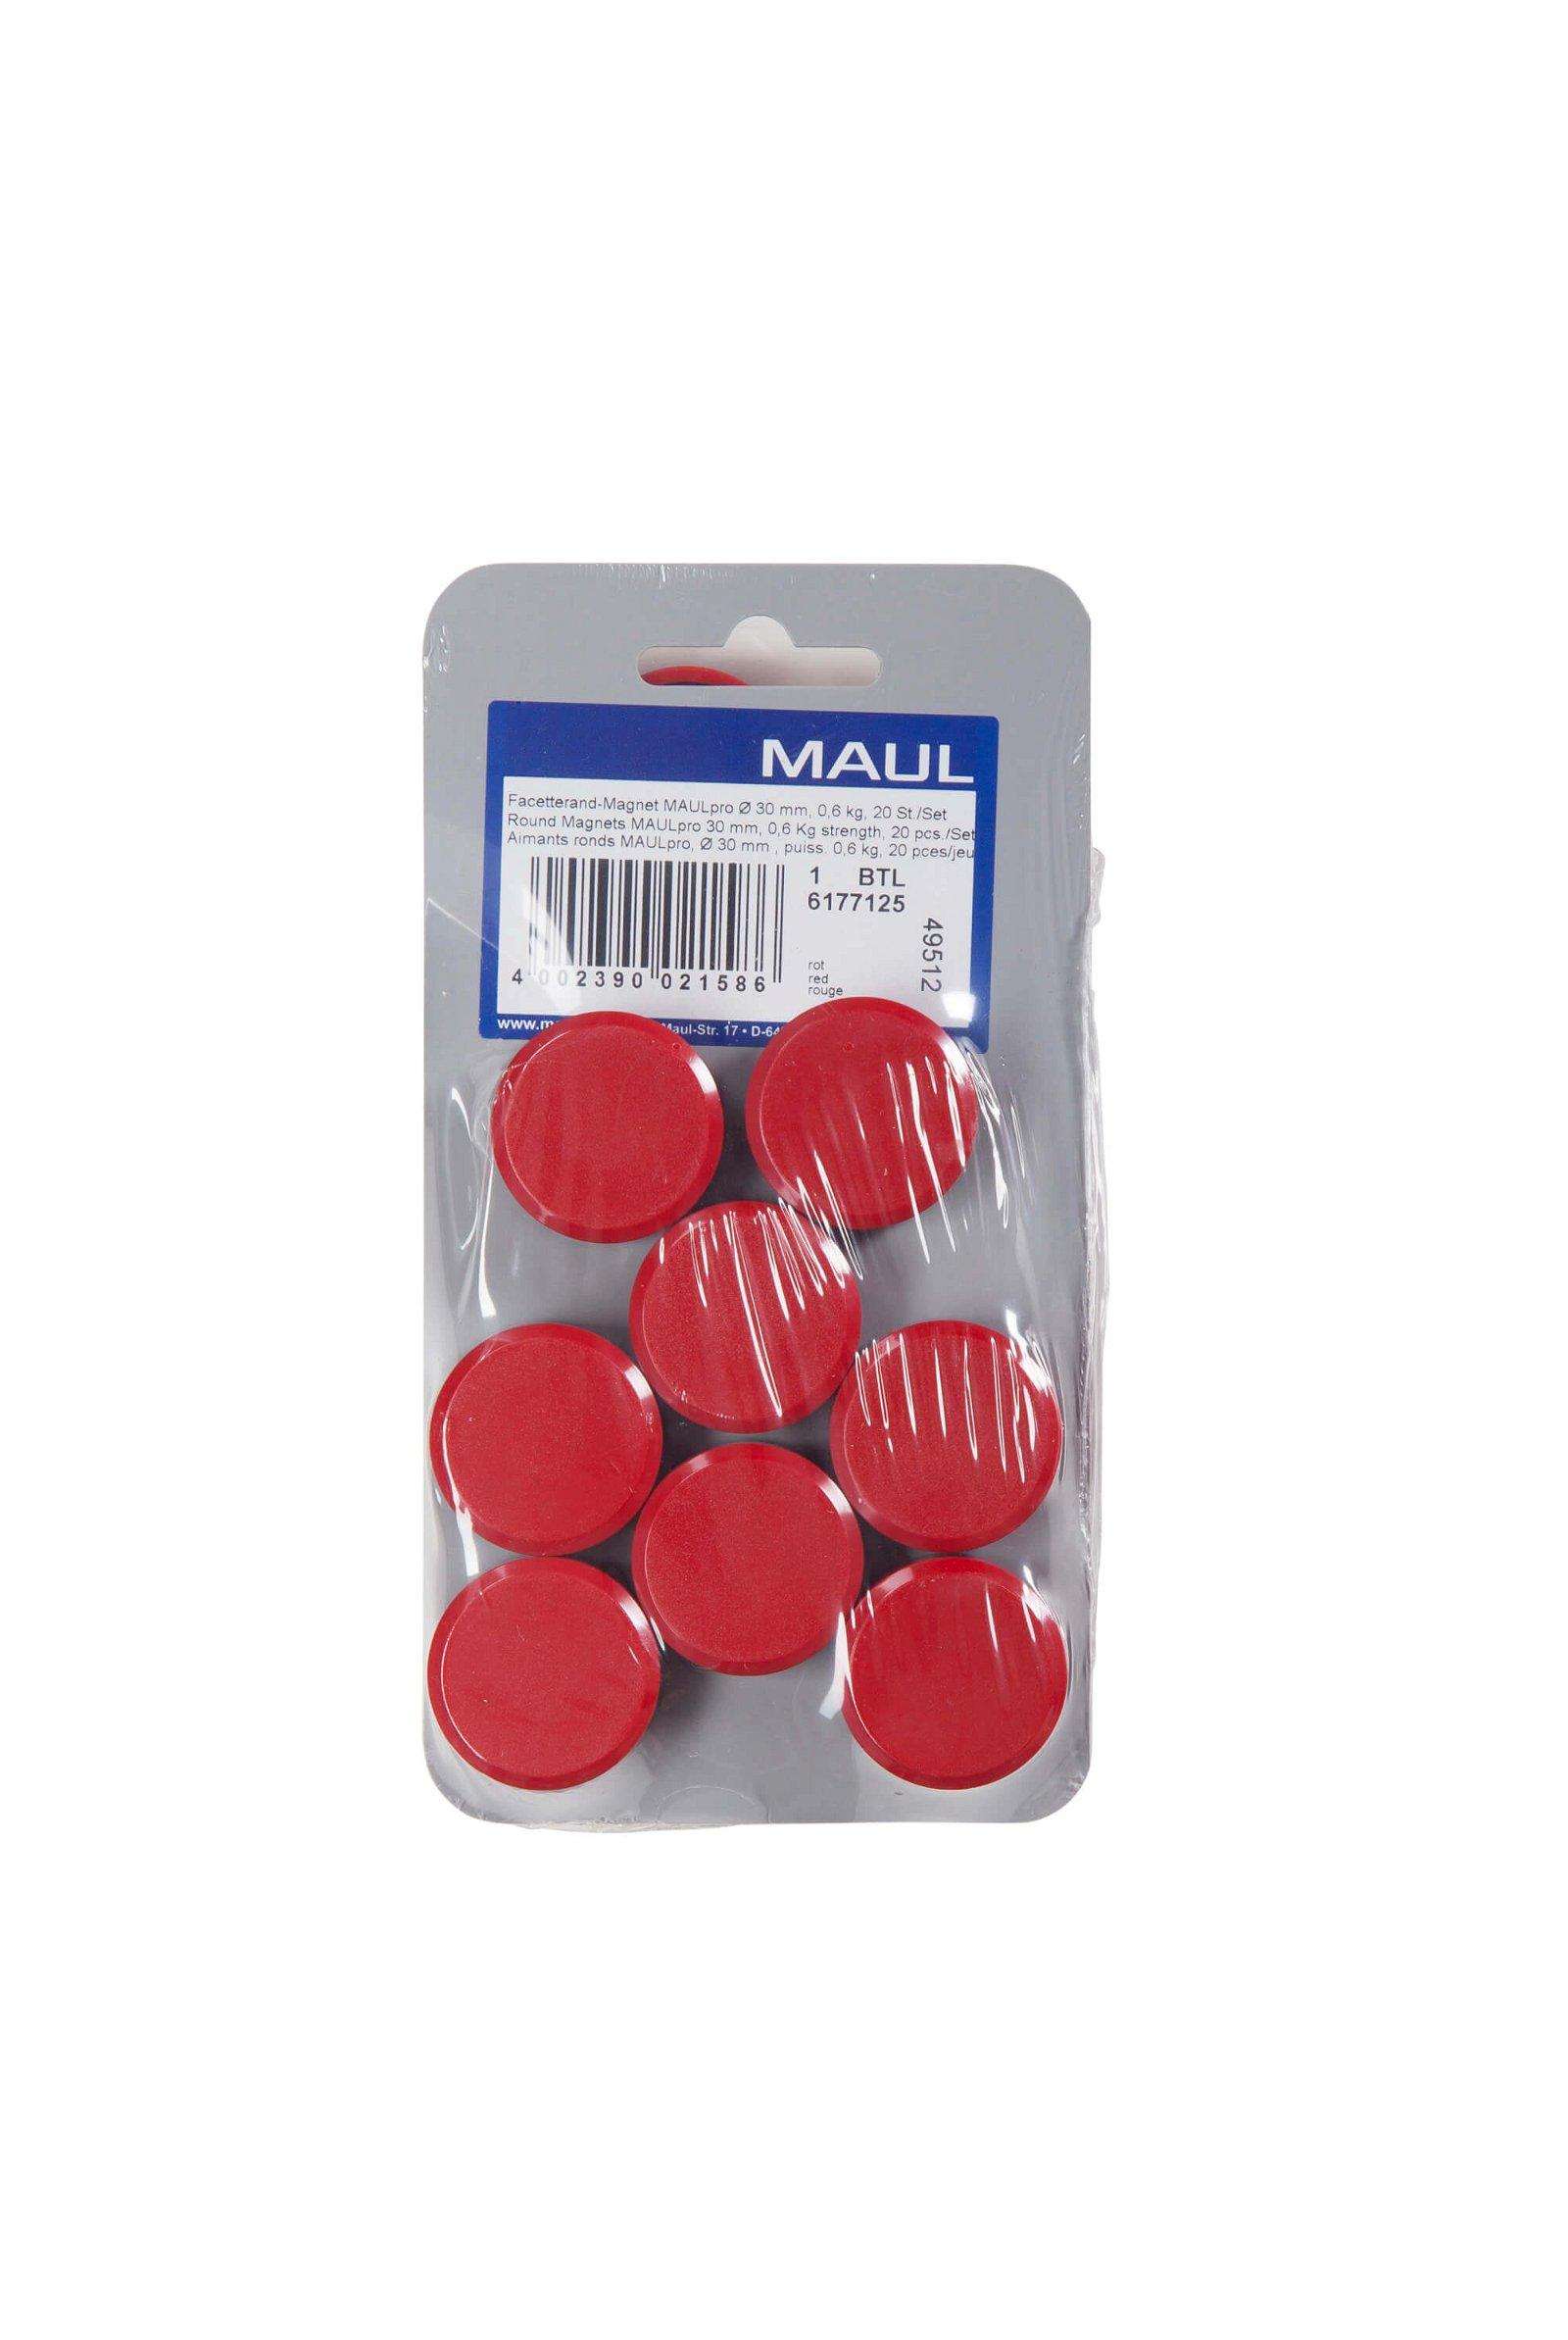 Facetterand-Magnet MAULpro Ø 30 mm, 0,6 kg, 20 St./Set, rot